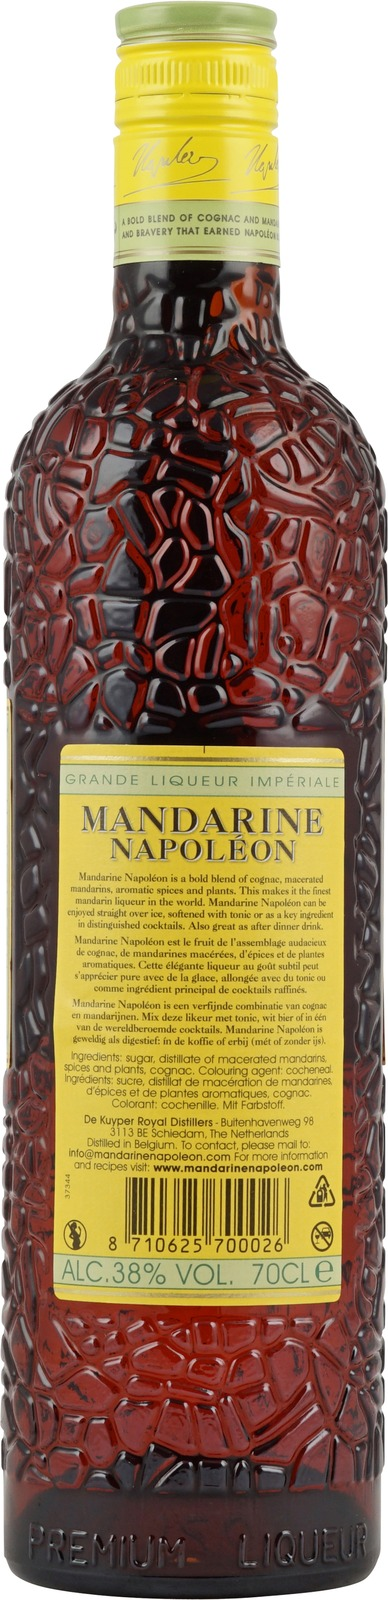 mandarine napoleon liqueur. Black Bedroom Furniture Sets. Home Design Ideas